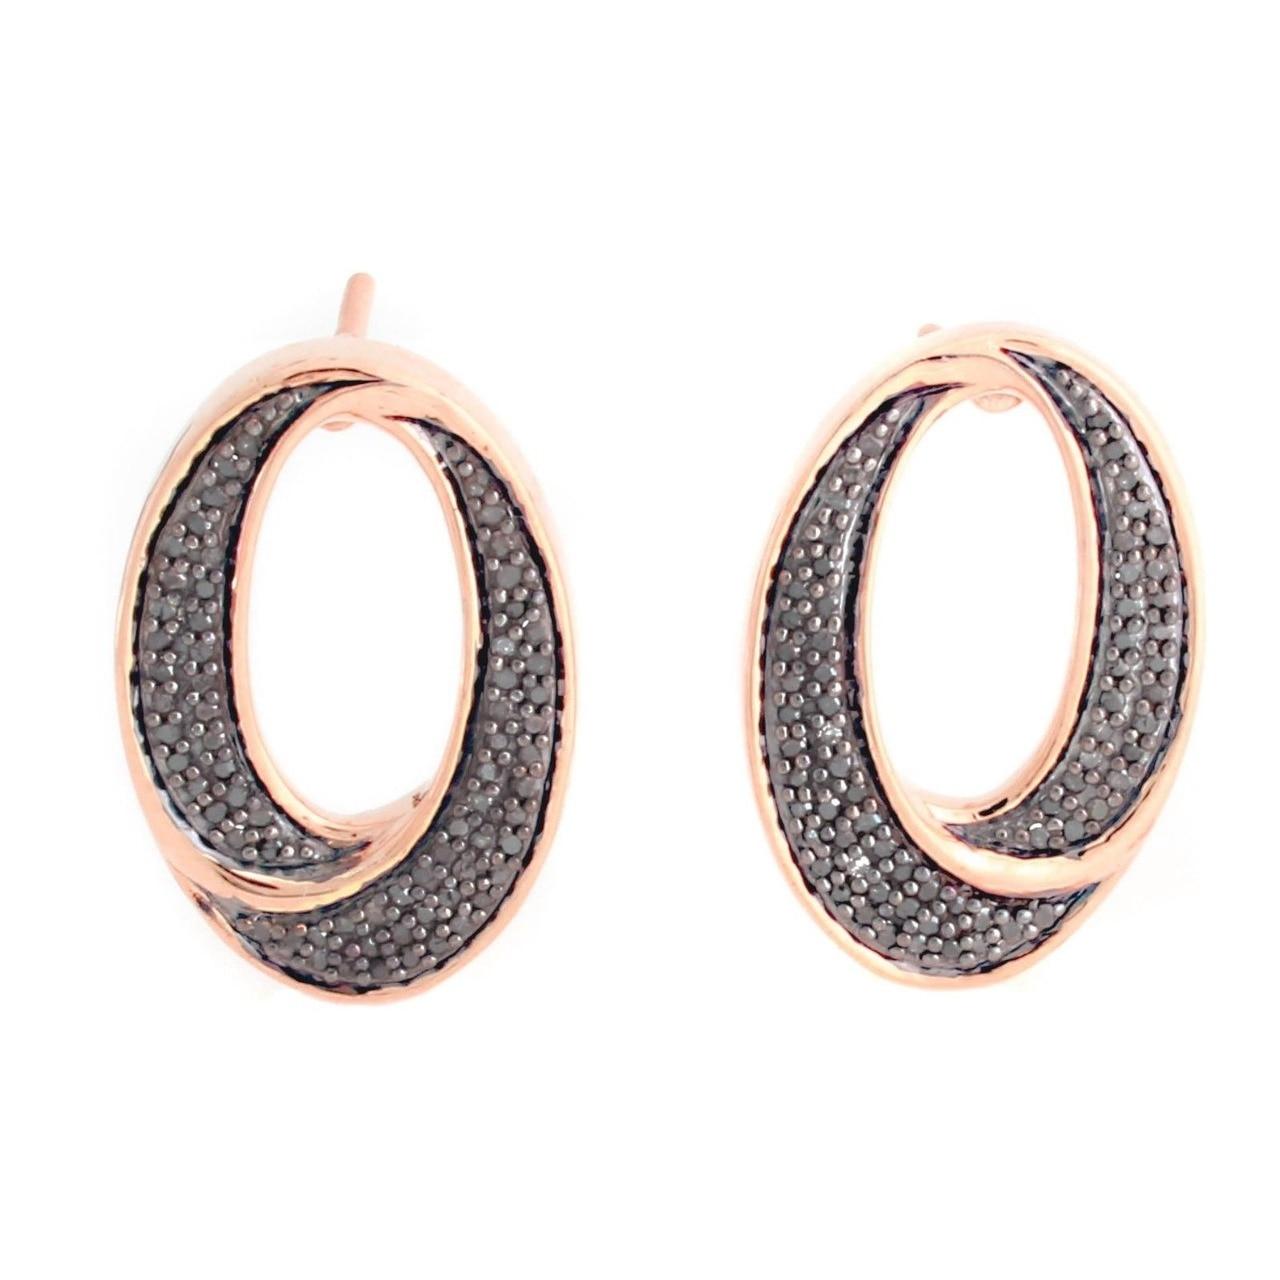 18K Rose Gold Over Sterling Silver 0.30 ct Black Diamond Stud Earrings Q608